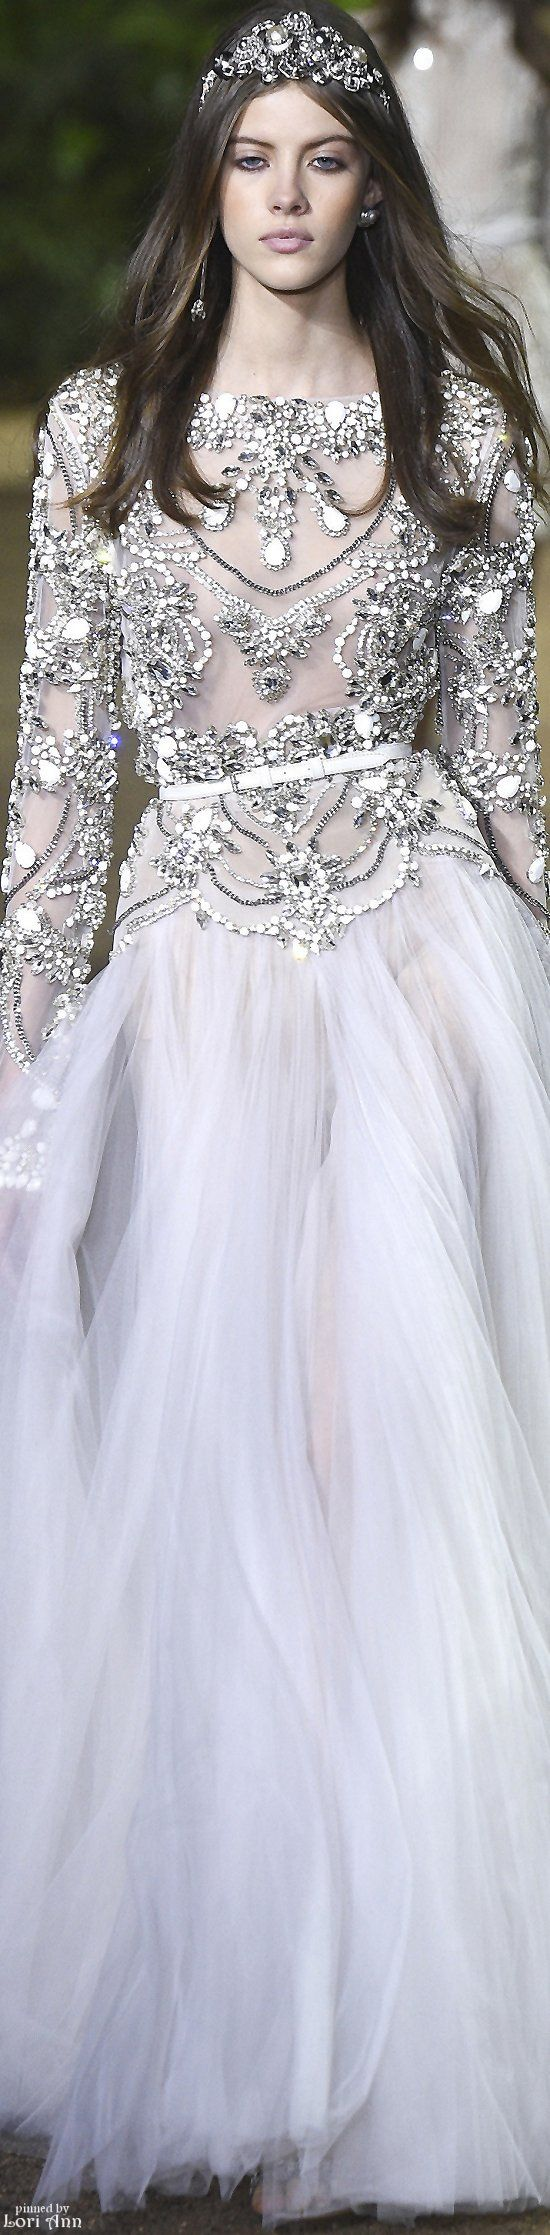 Ꭼɭ¡ҽ Ꮥaaß ♔ Ḩaųʈҽ Ꮳoųʈųɽҽ Spring 2016 Love this dress I wish I had it like or re-pin if you whiz you had this to